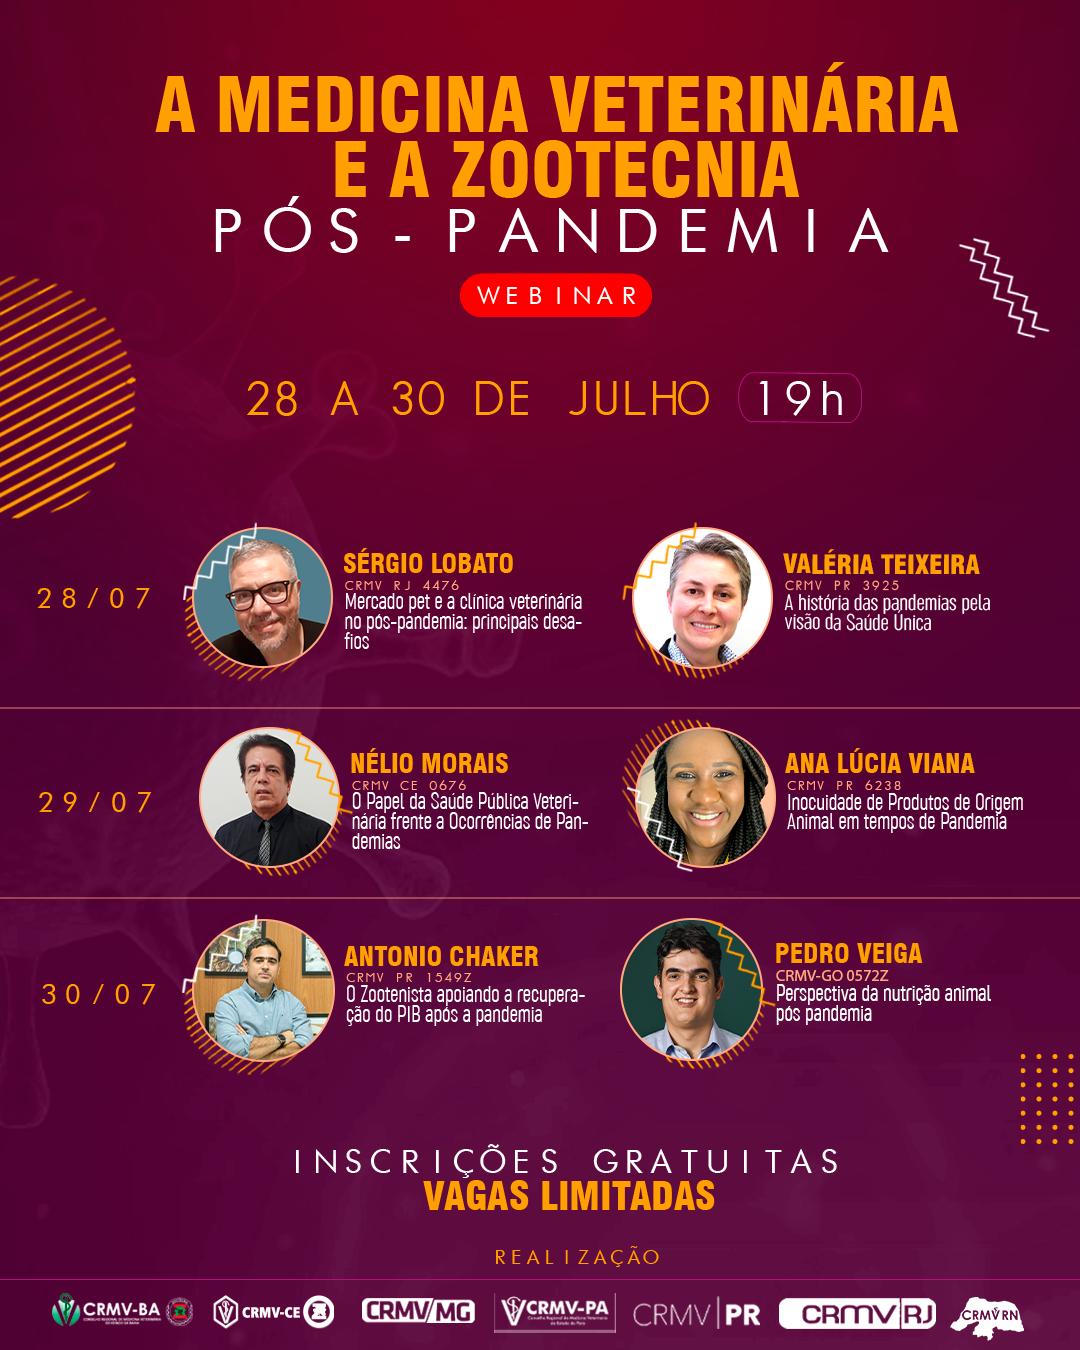 Webinar discute como será a Medicina Veterinária e a Zootecnia no futuro pós-pandemia